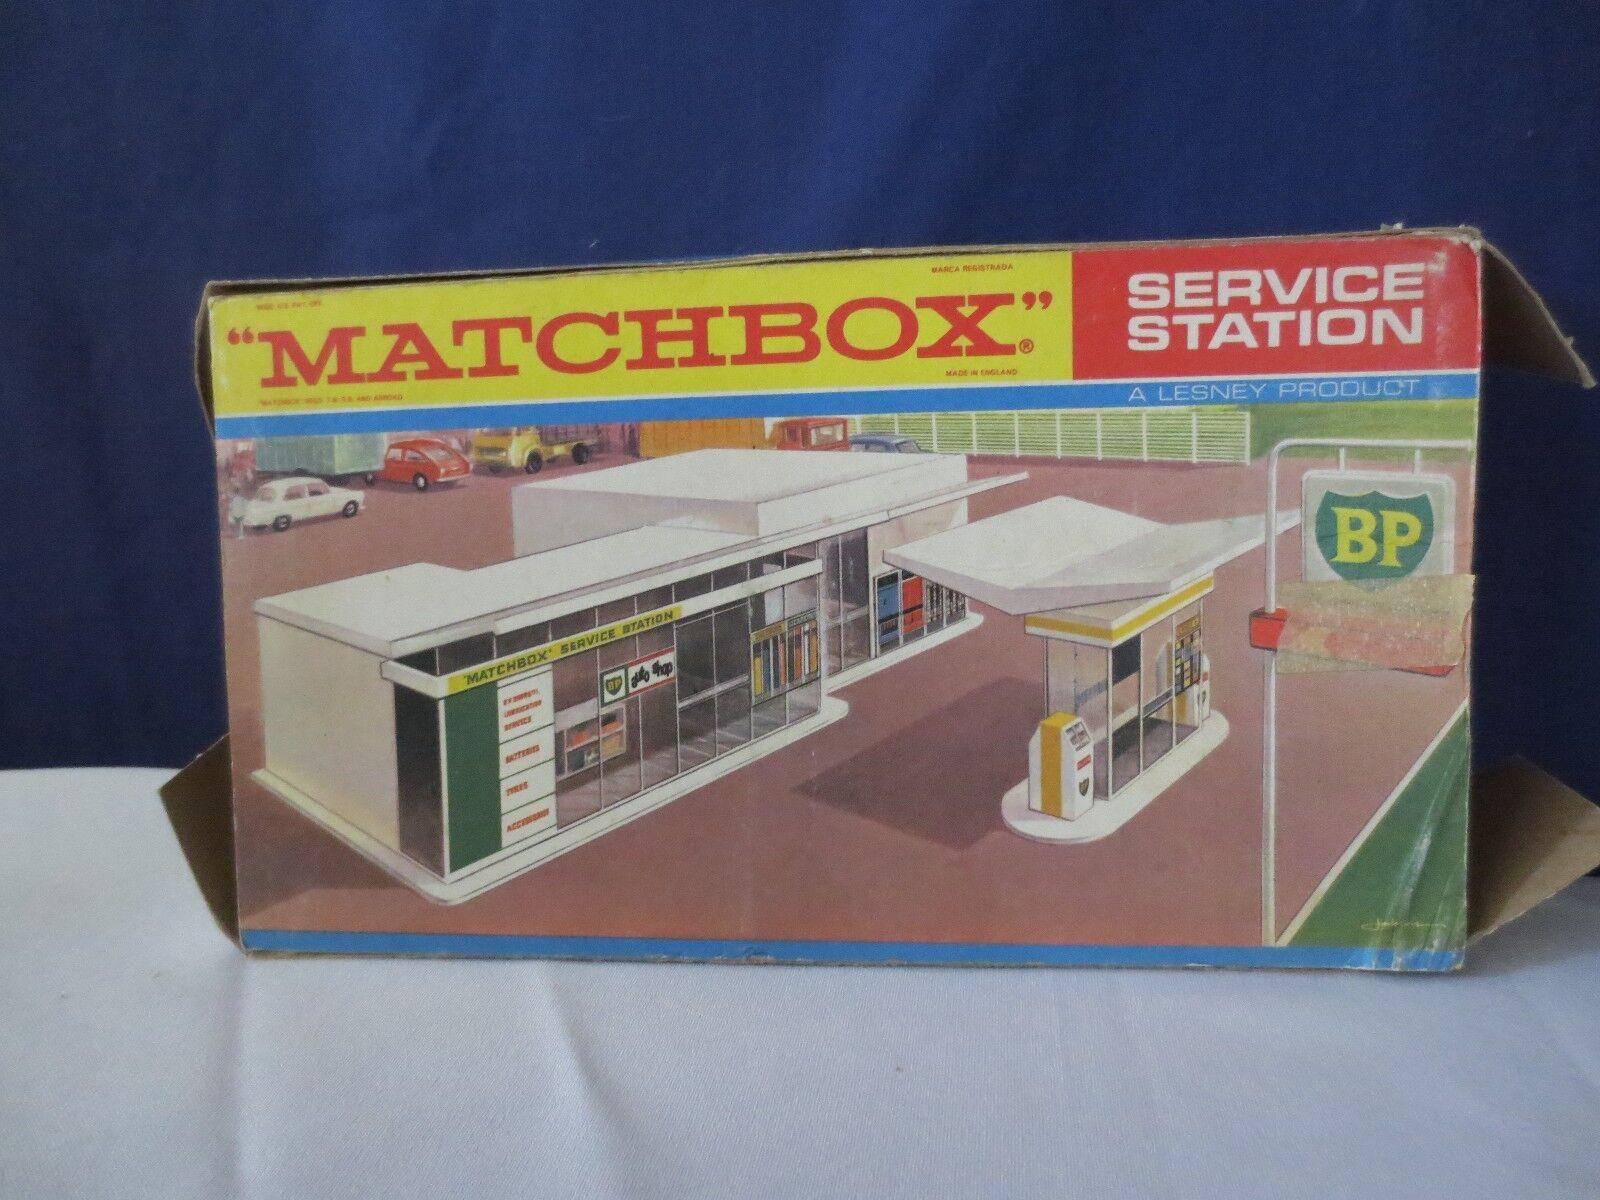 Vintage Lesney Matchbox BP Service Station MG-1 Made in ENGLAND  RARE